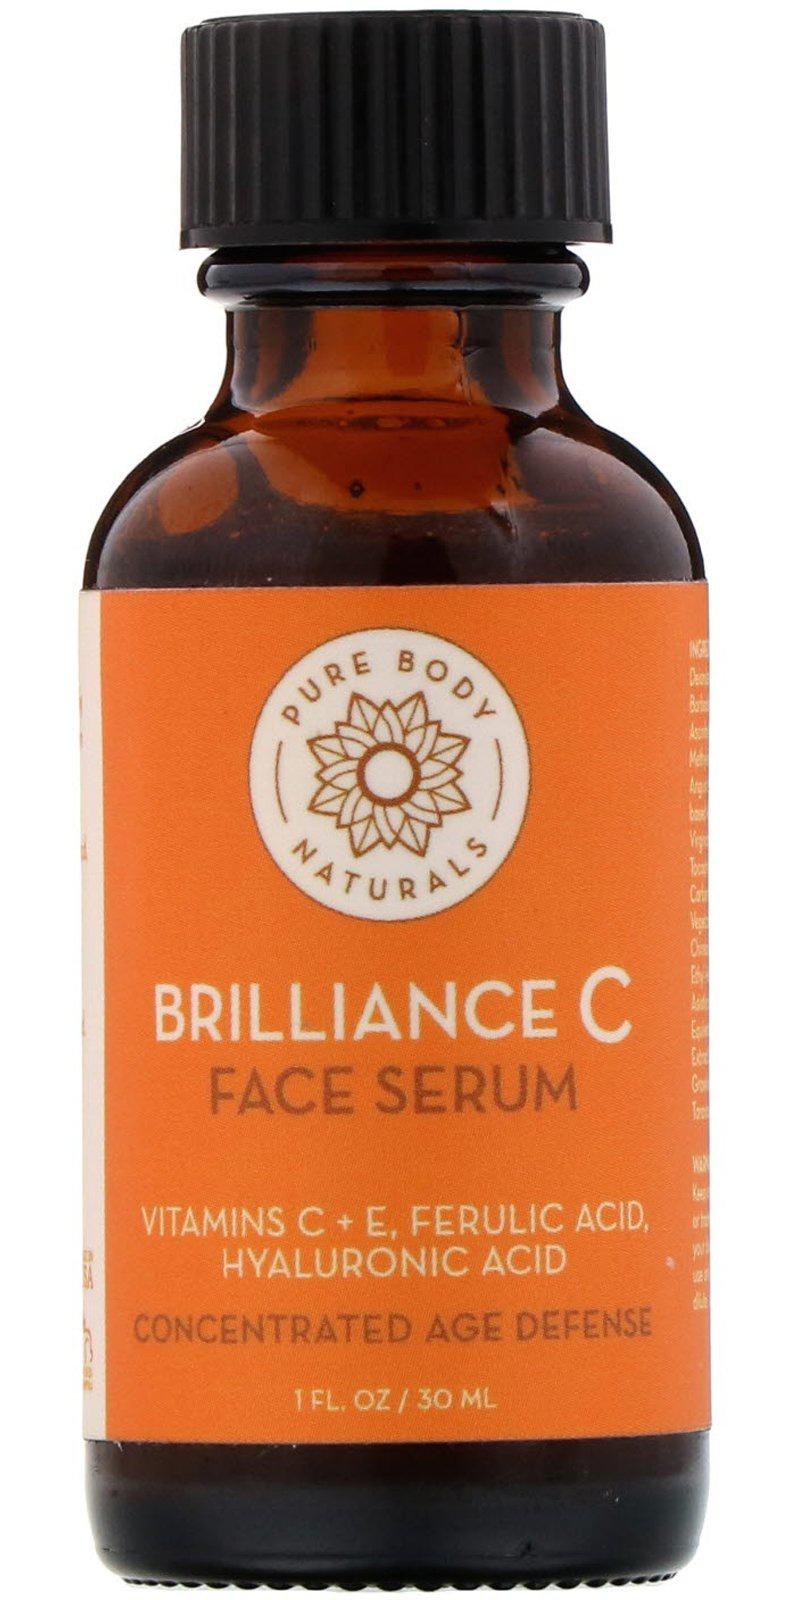 Pure Body Naturals Brilliance C Face Serum